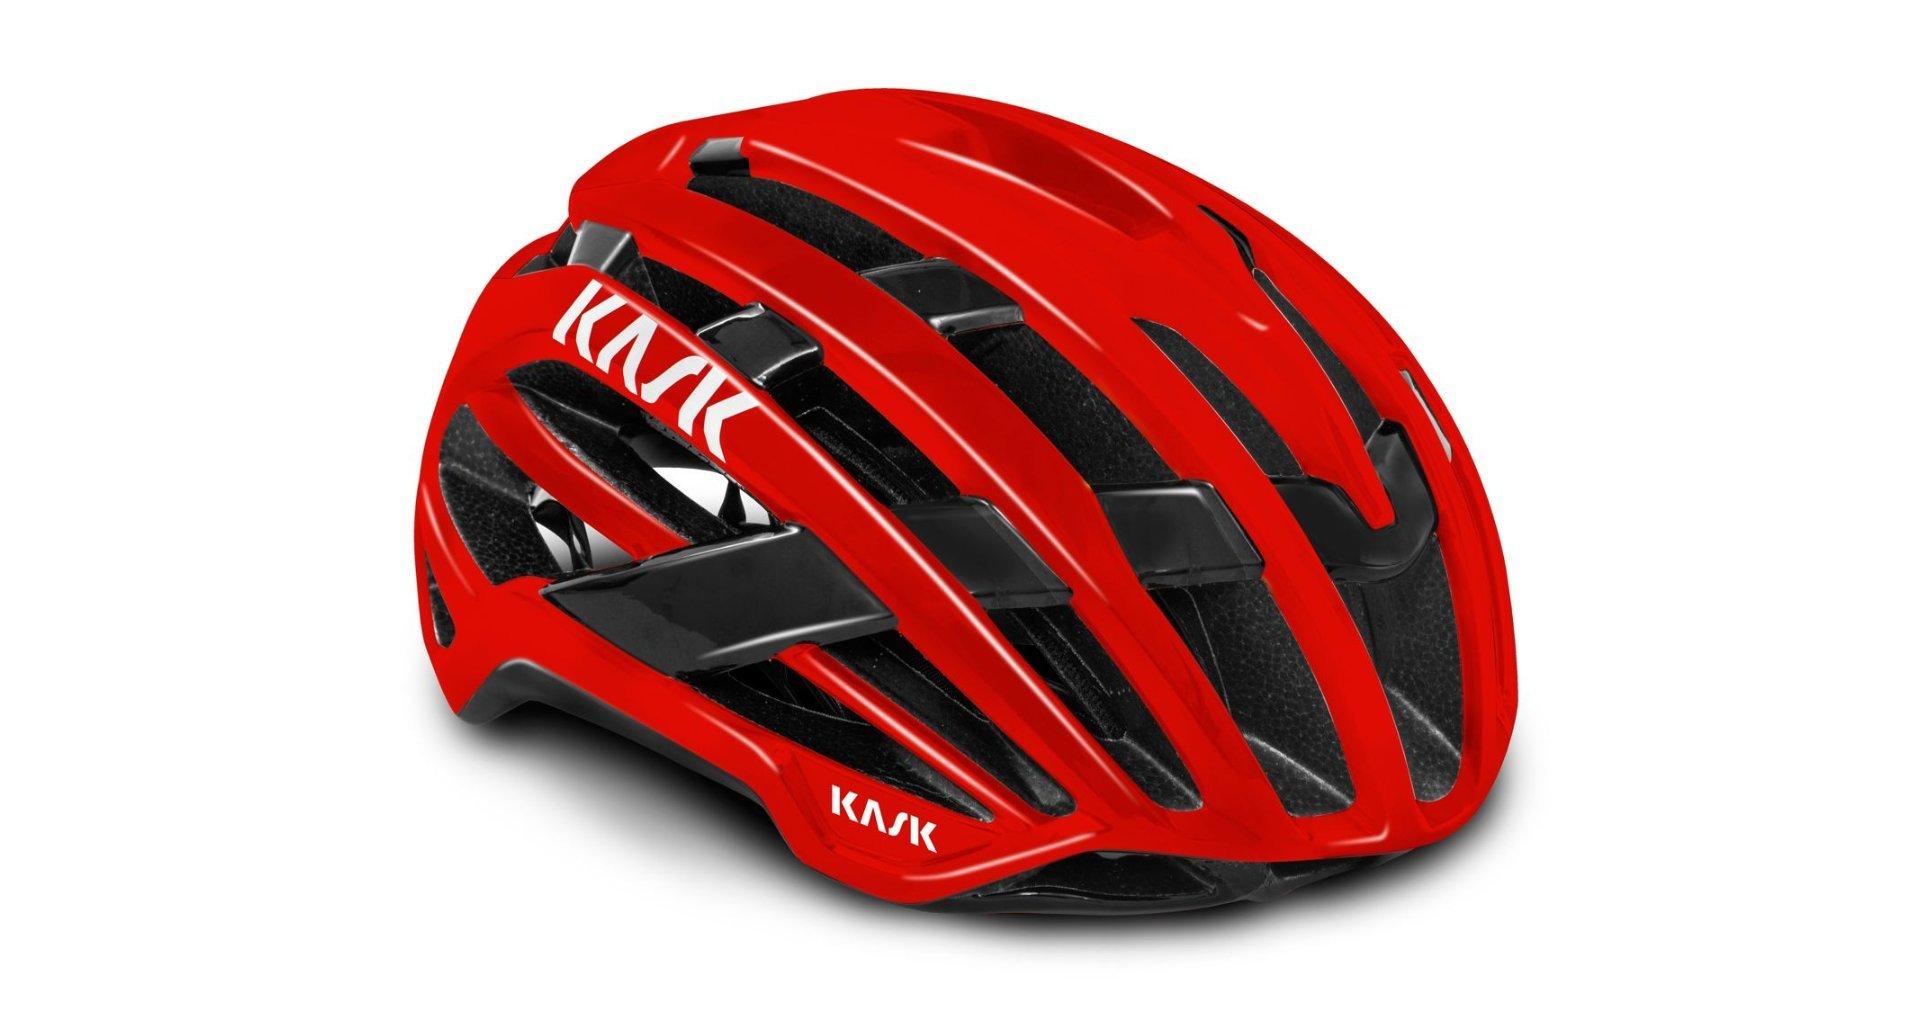 Kask Valegro Helmet, Small, Red